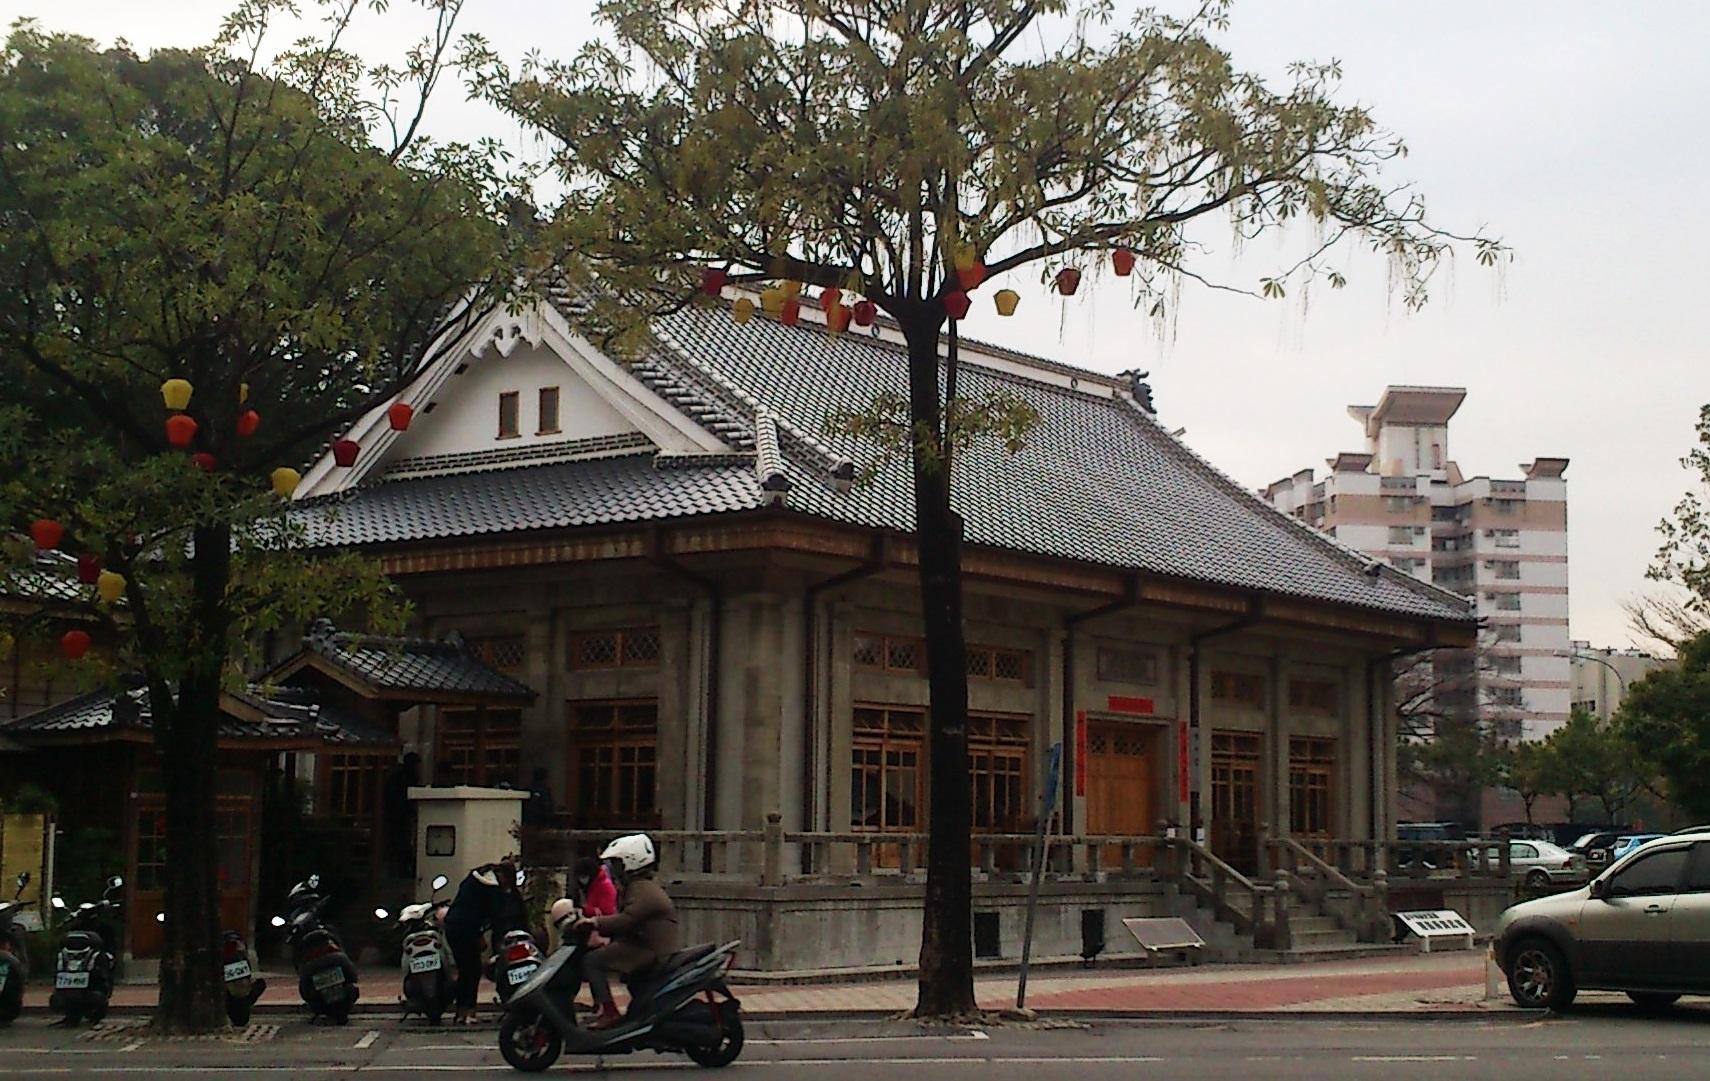 The grand Taichung Butokuden